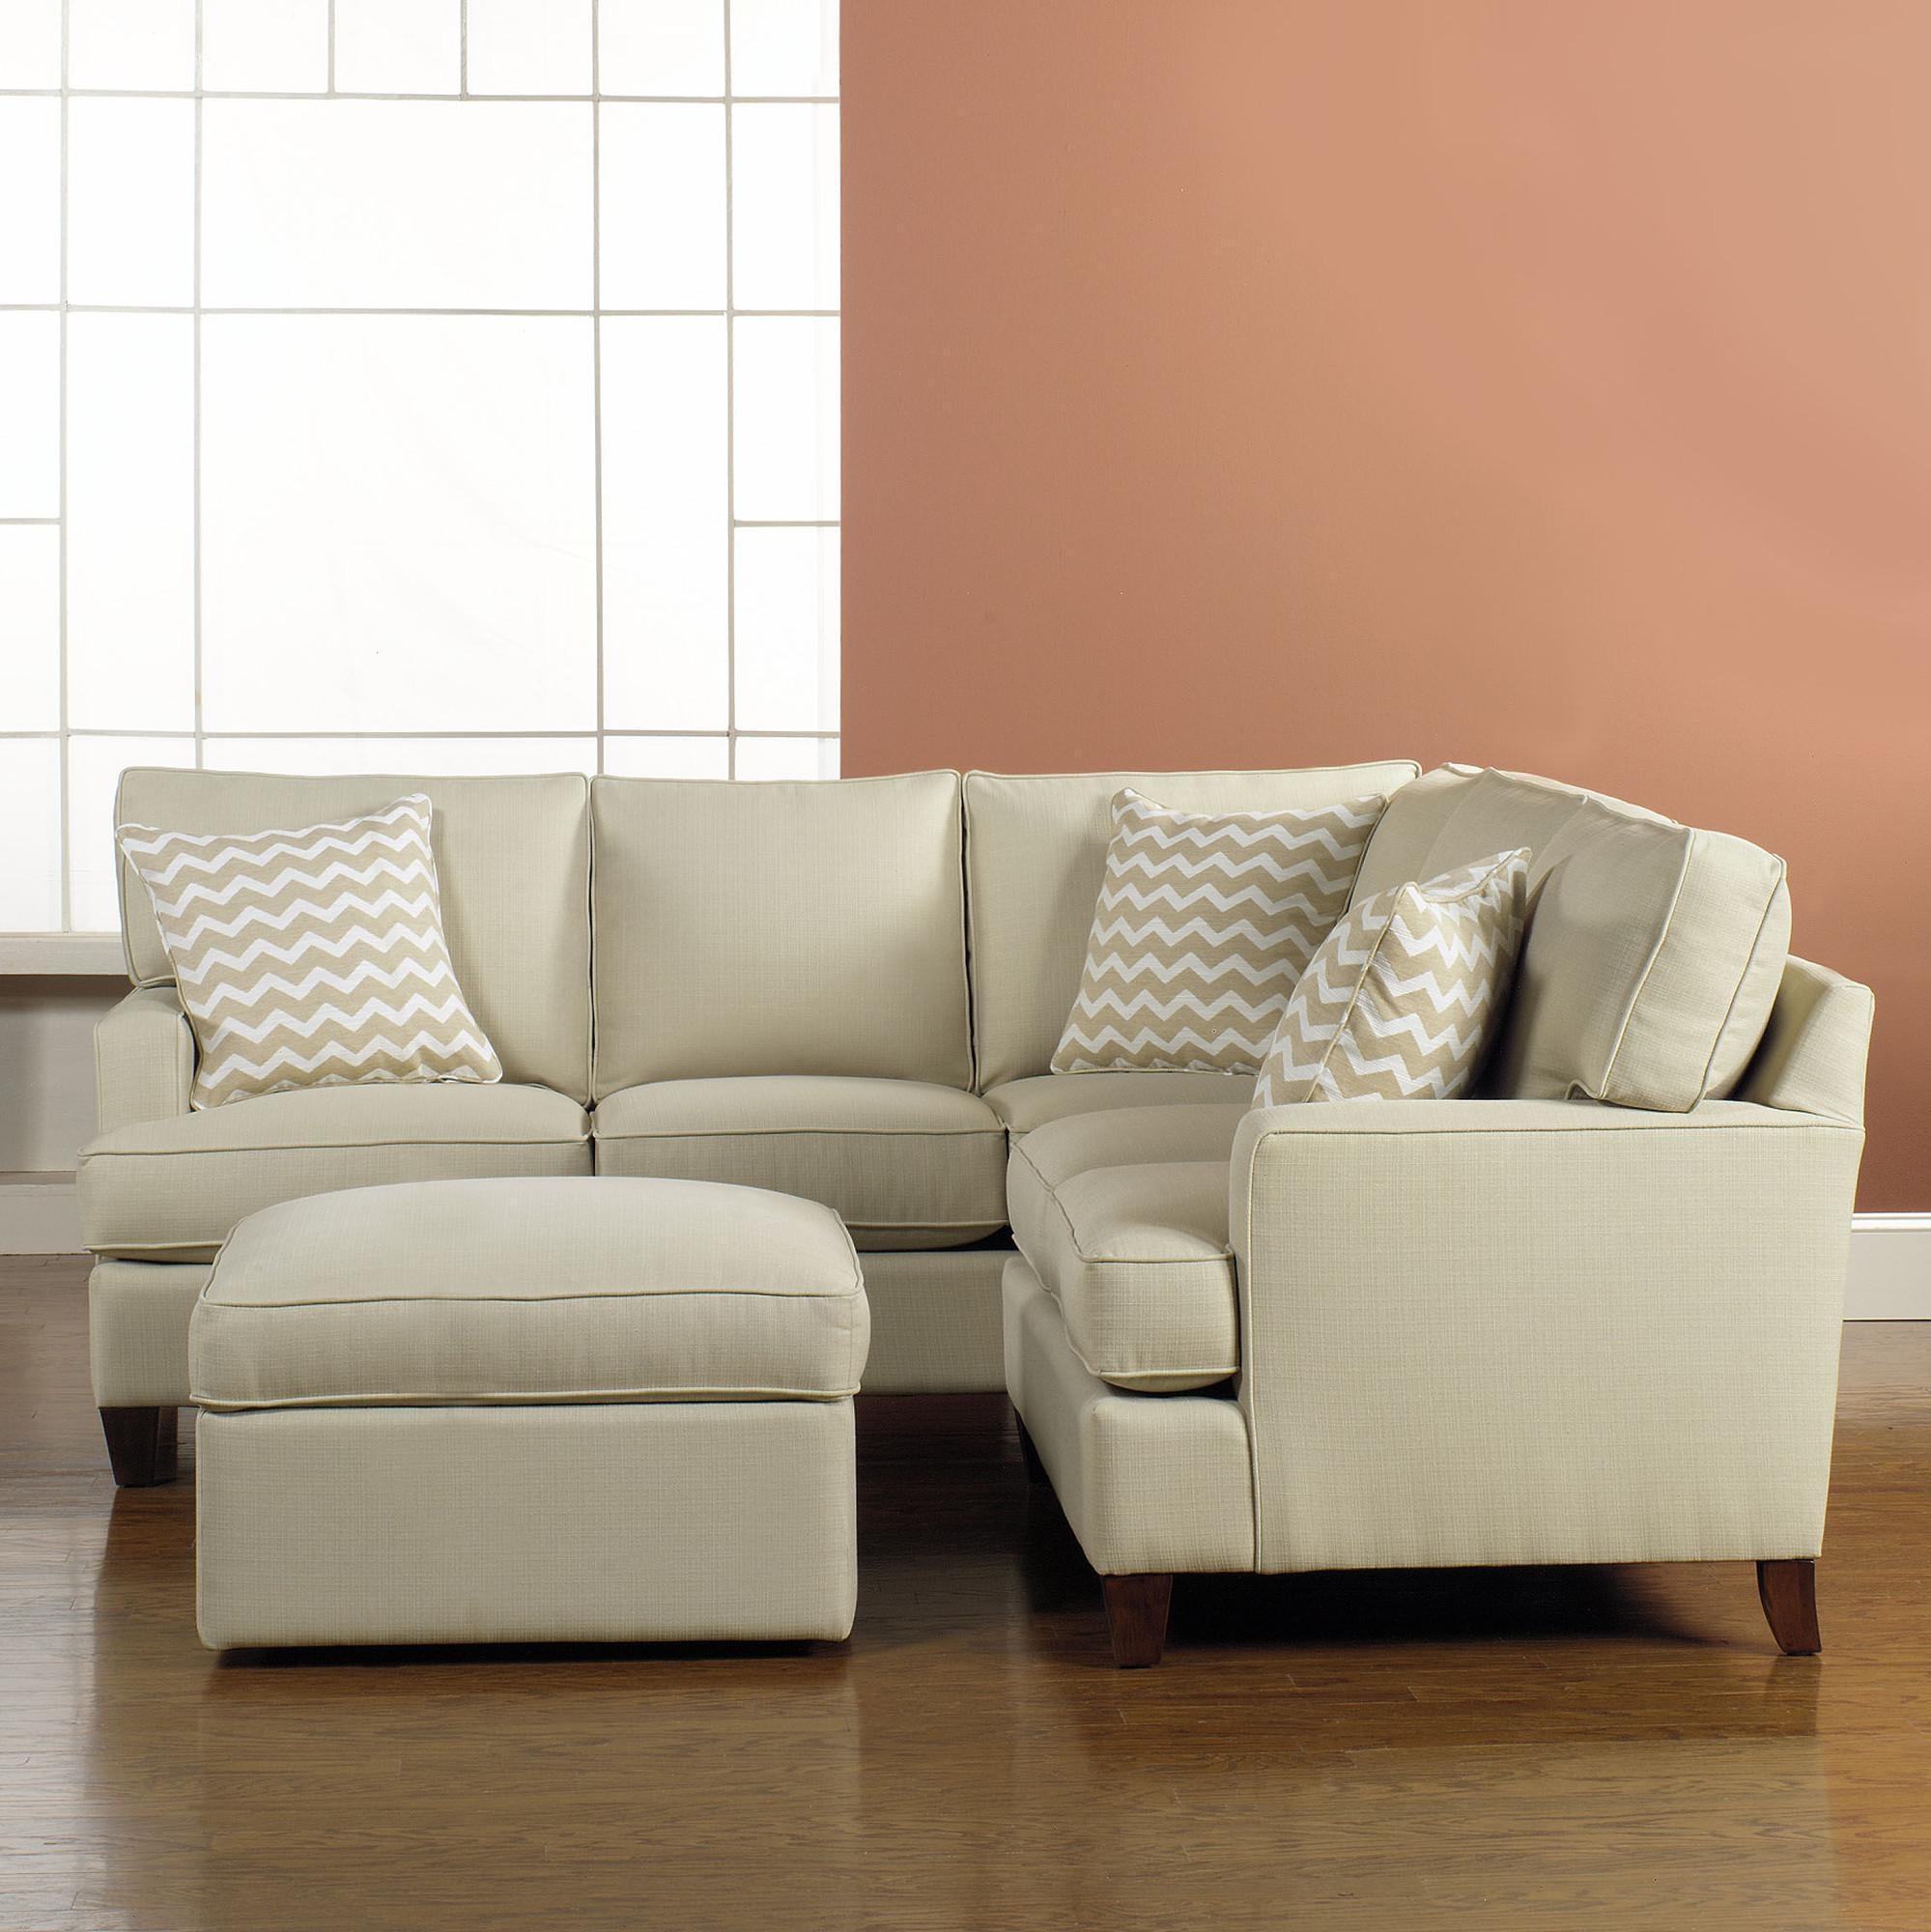 20 inspirations sleek sectional sofa